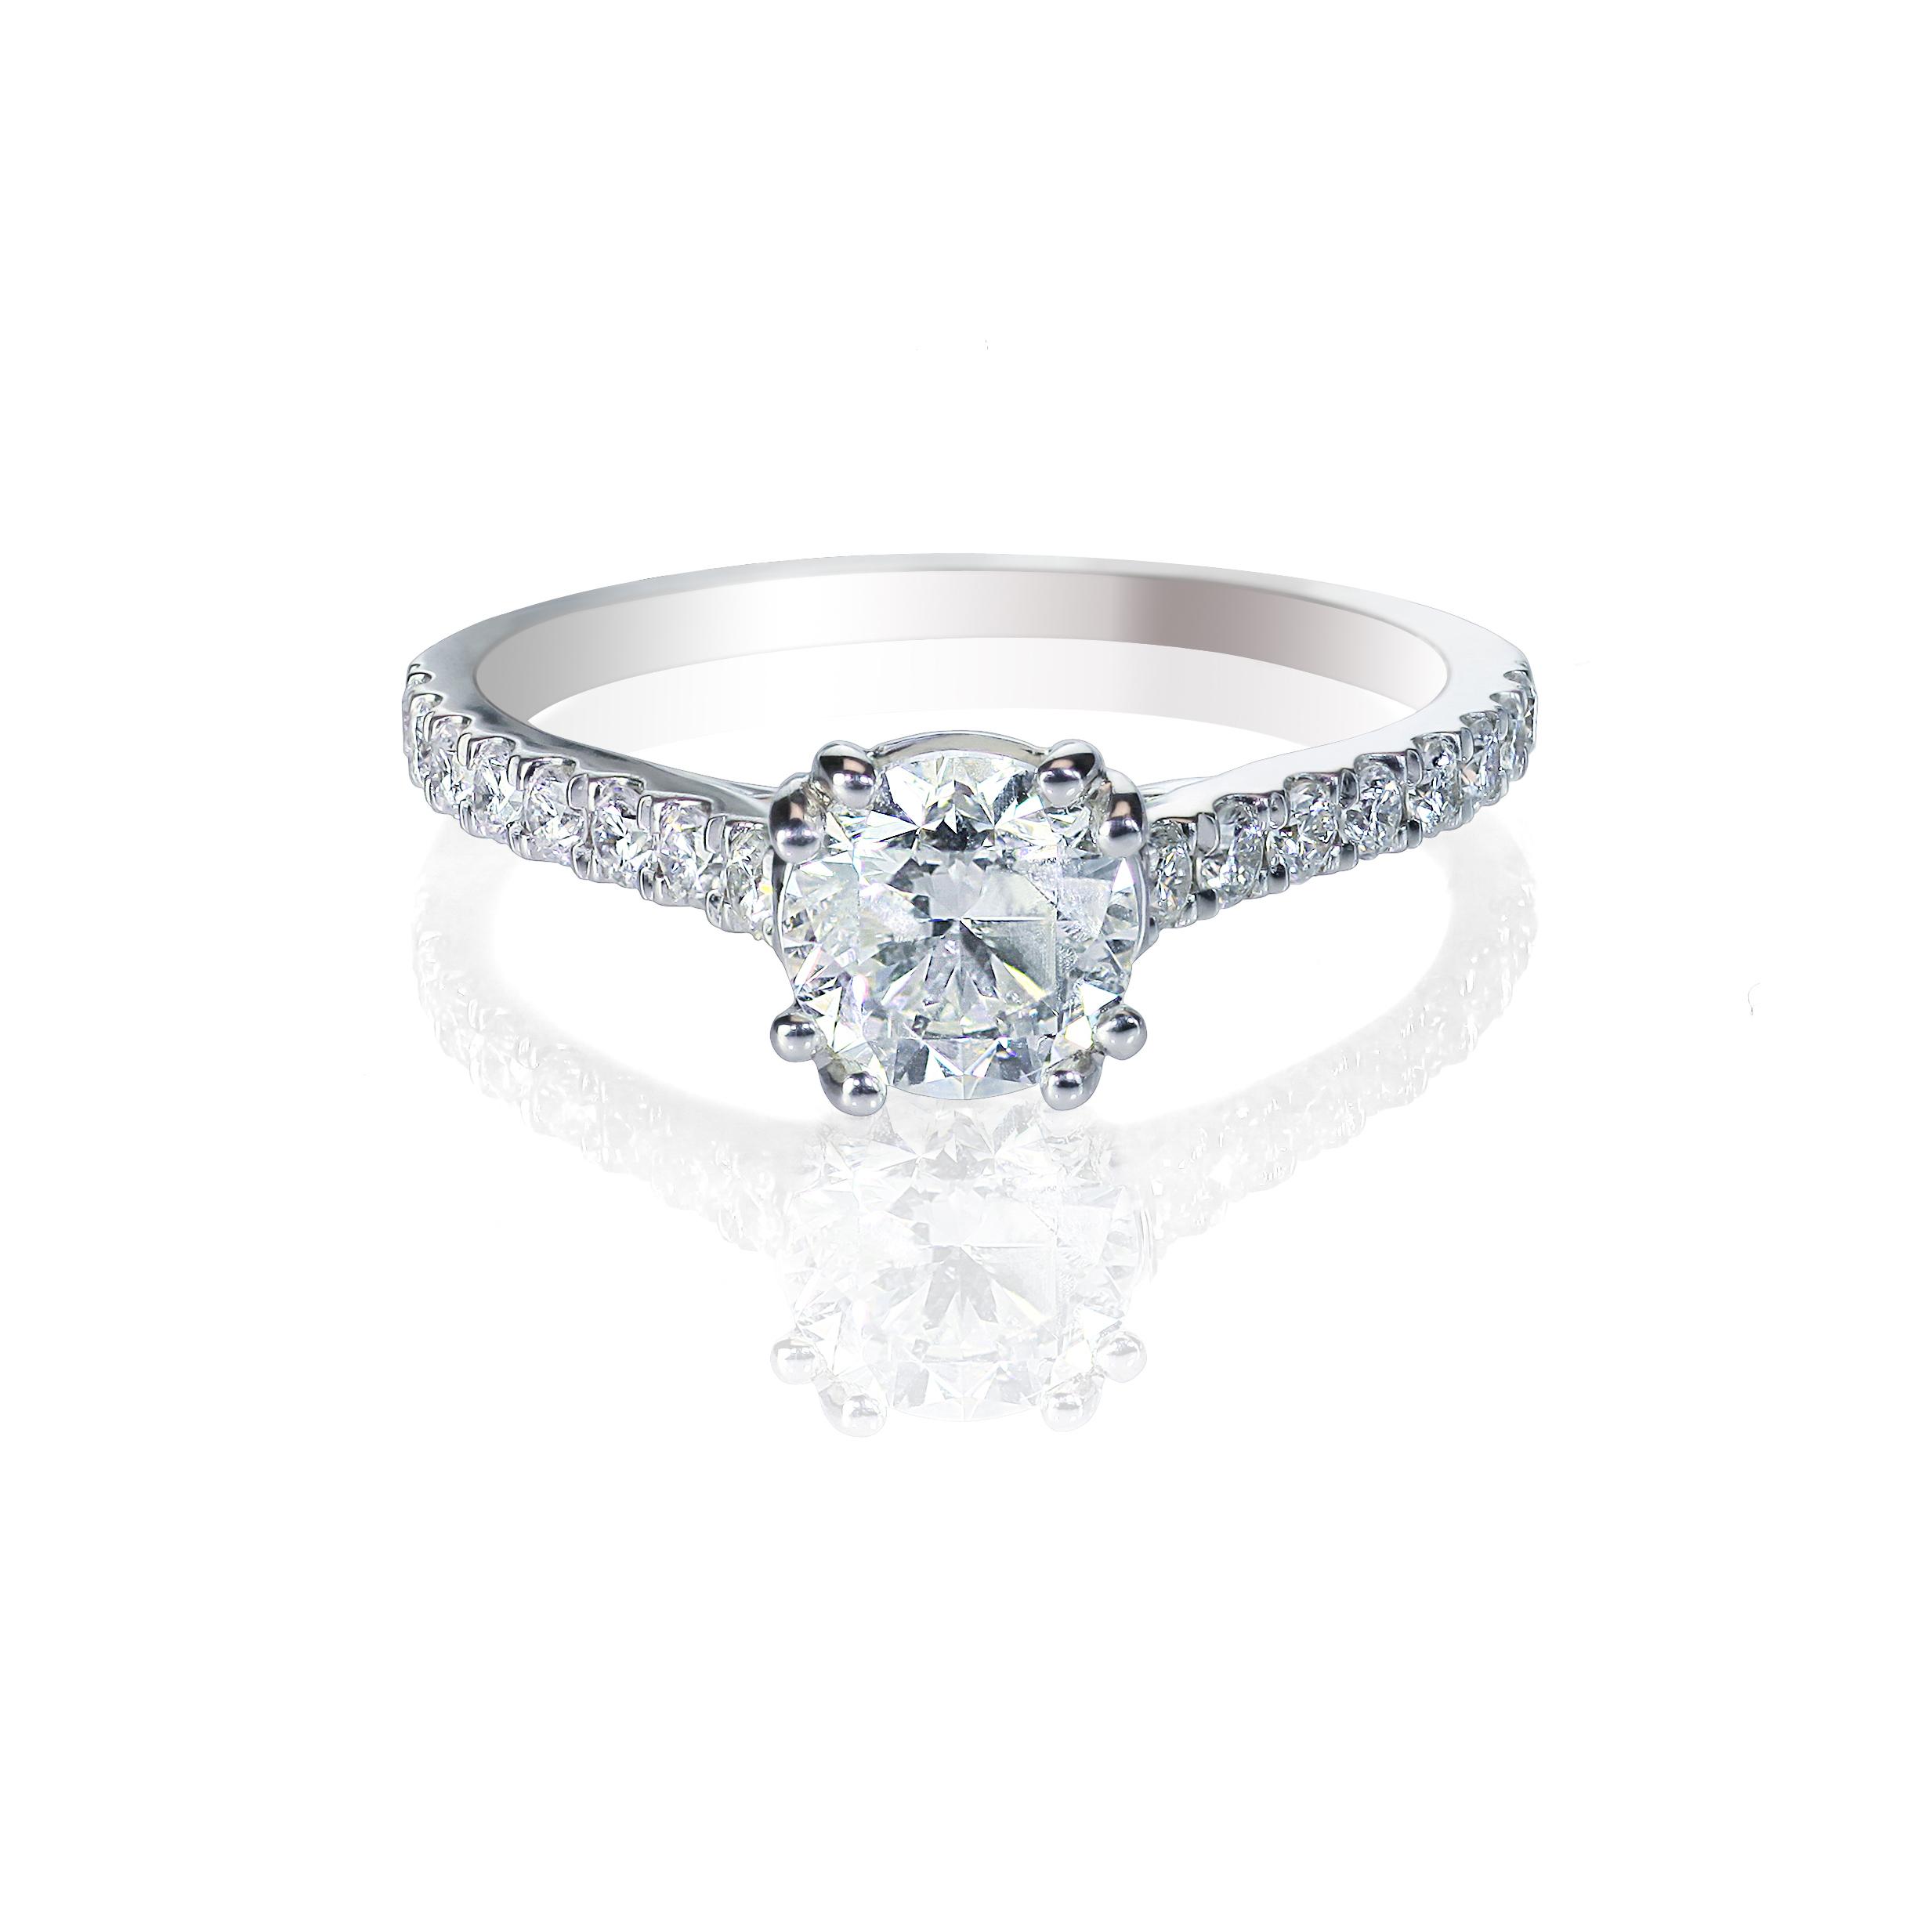 Diamond Ring -Solitare - Side Stones